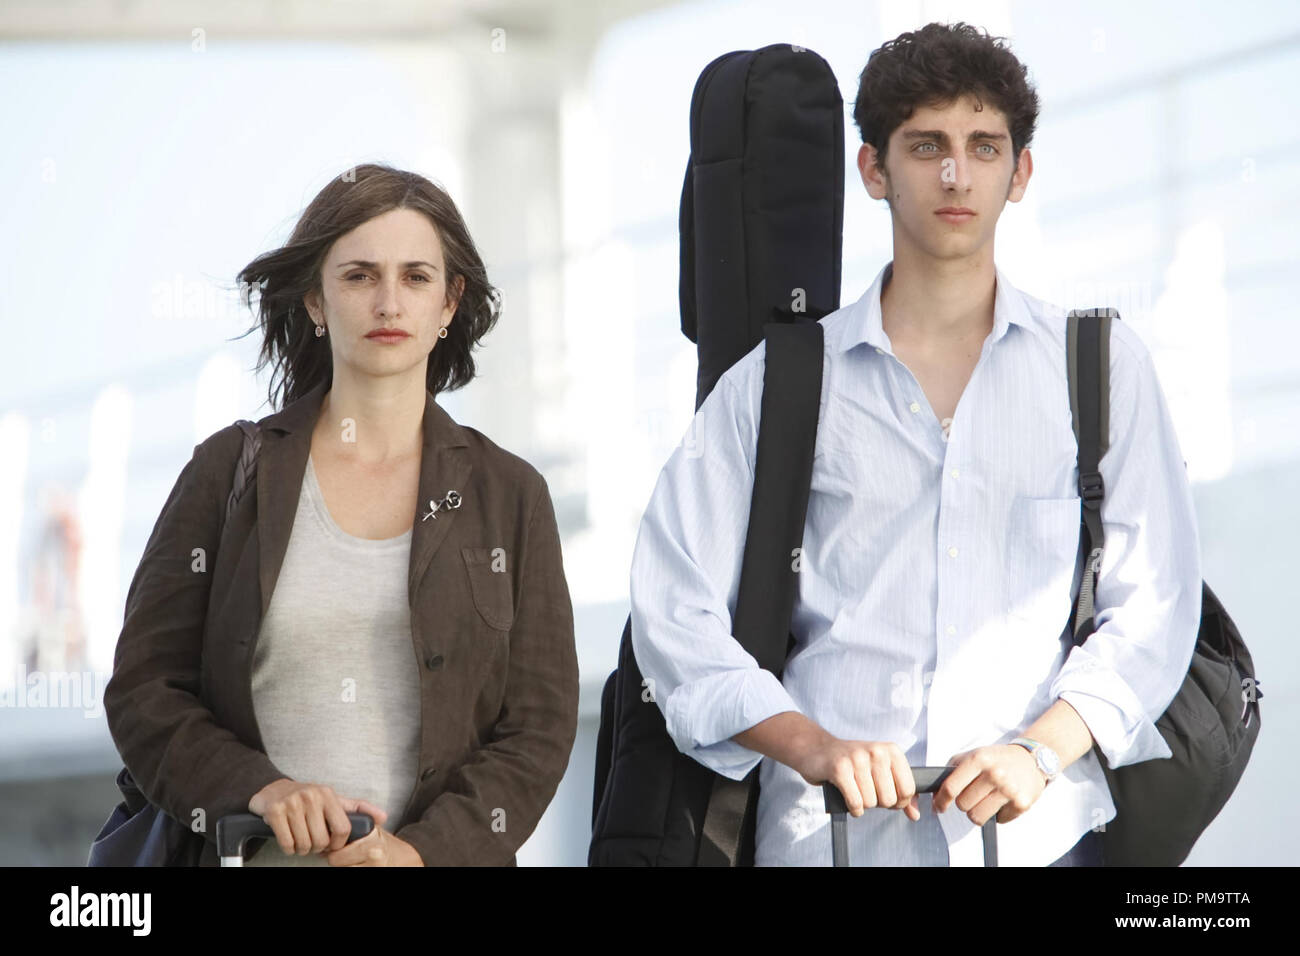 "Penelope Cruz and Pietro Castellitto in Entertainment One's ""Twice Born"" 2012 Stock Photo"